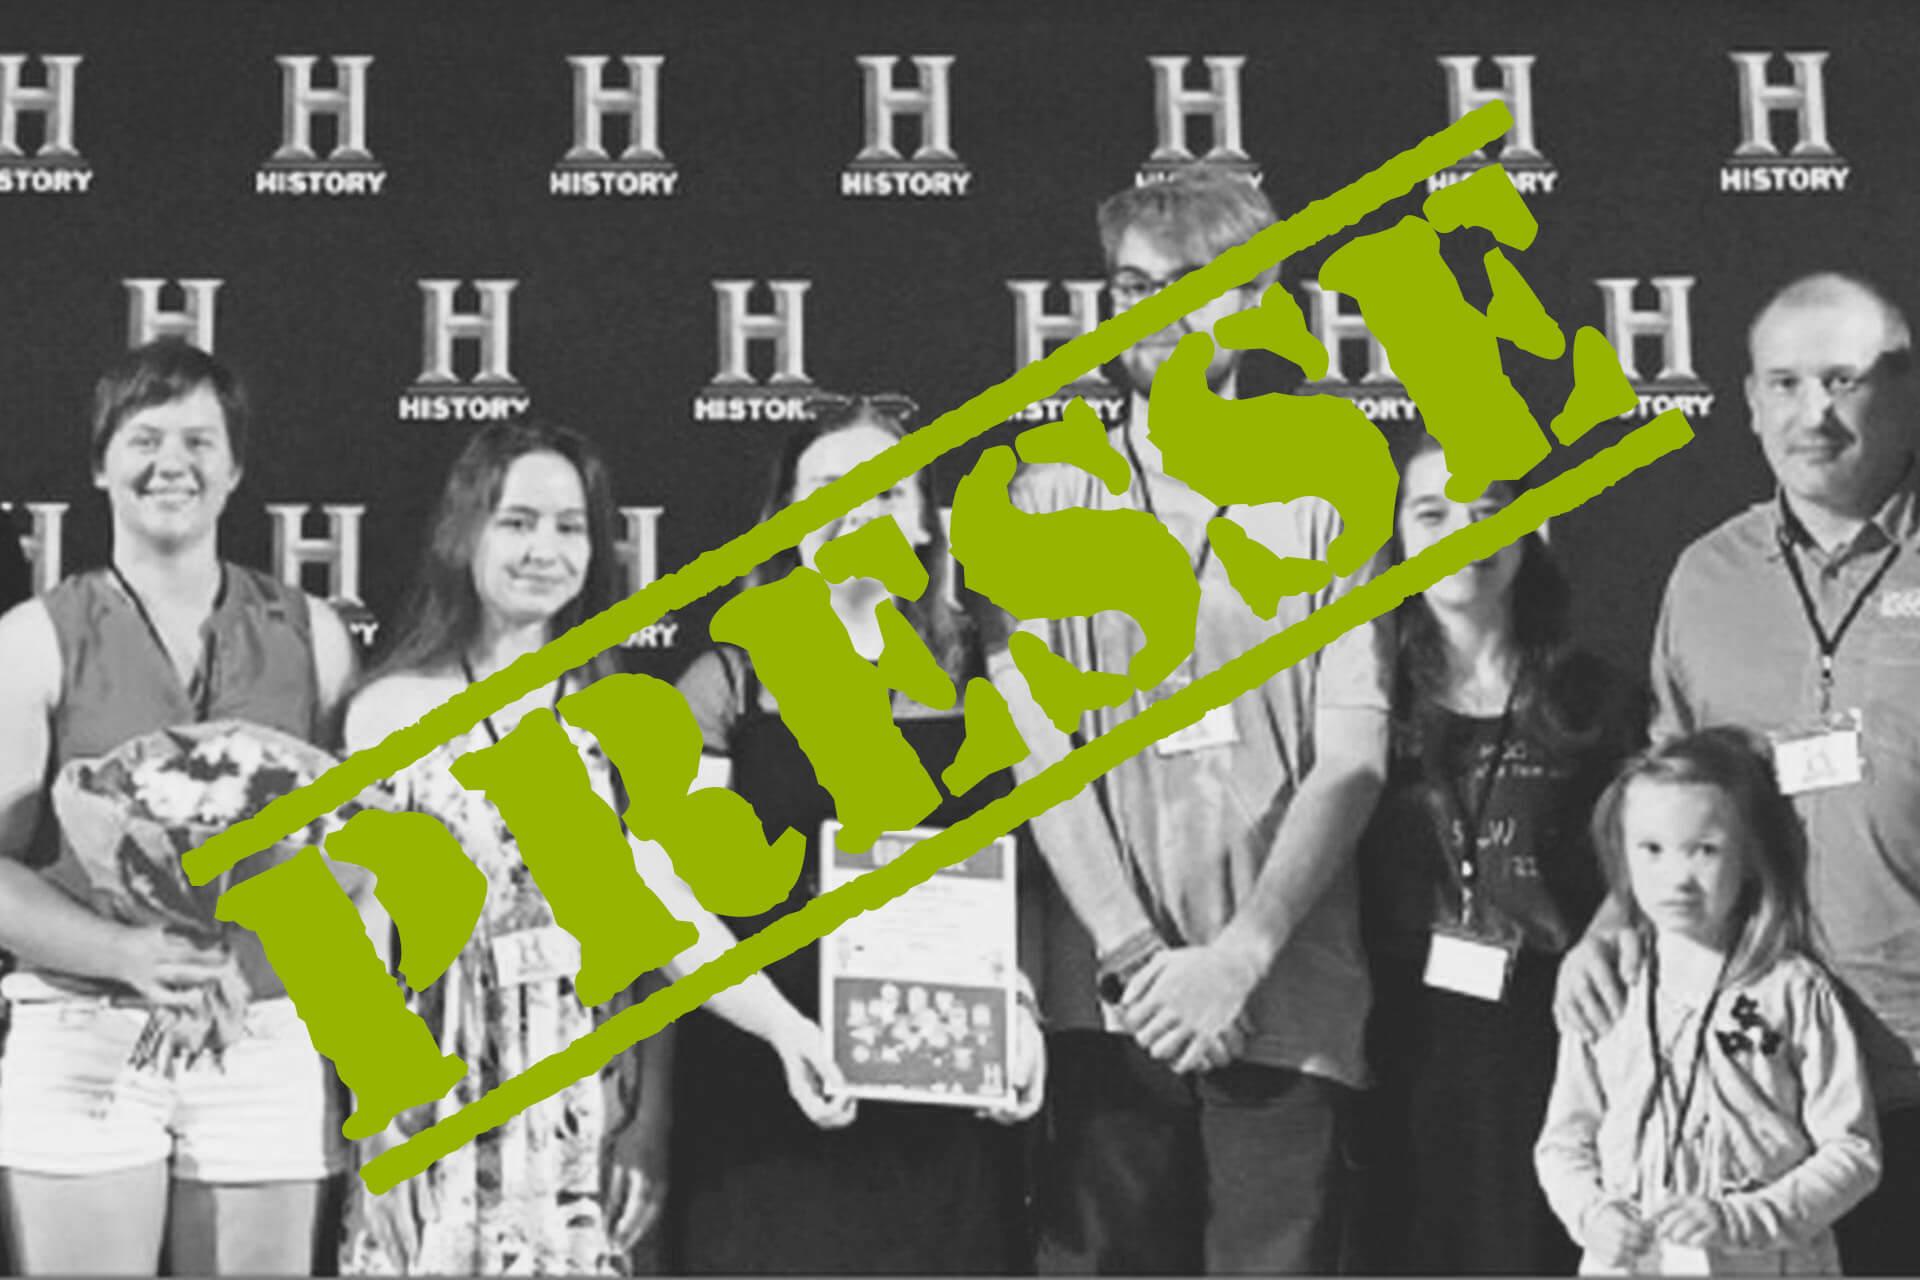 2017 06 28 Presse Preisverleihung History Award Clip Content 1